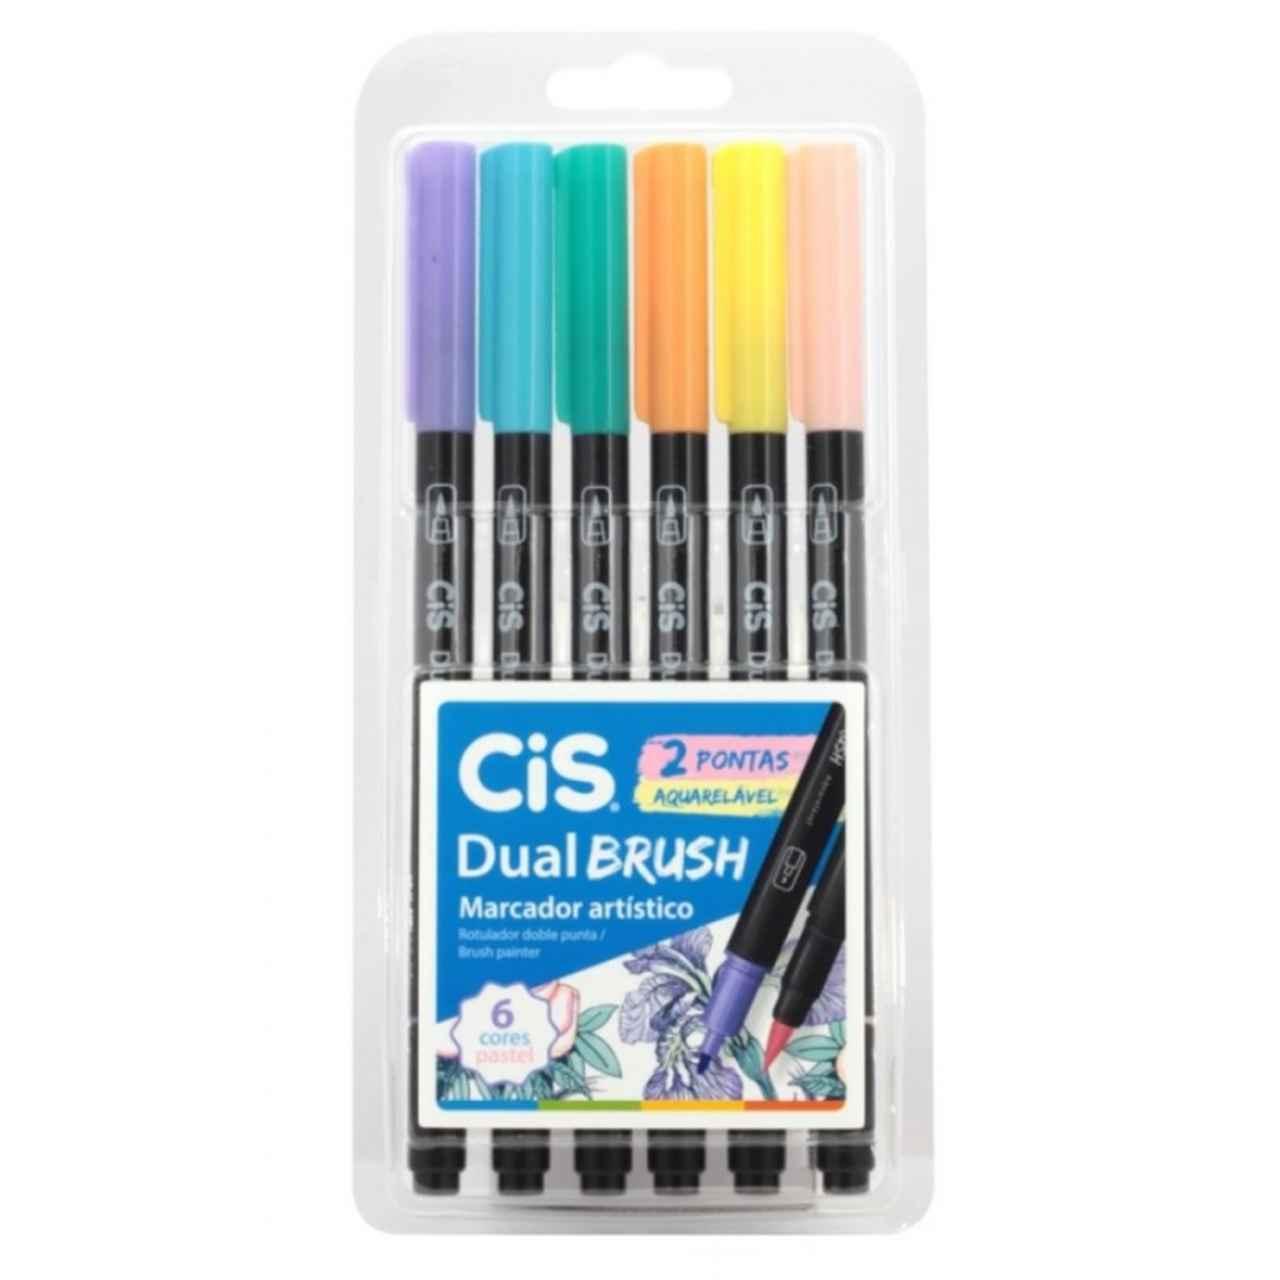 Kit Caneta Brush Ponta Dupla Pastel Aquarelavel 6 Cores Pastel - CIS